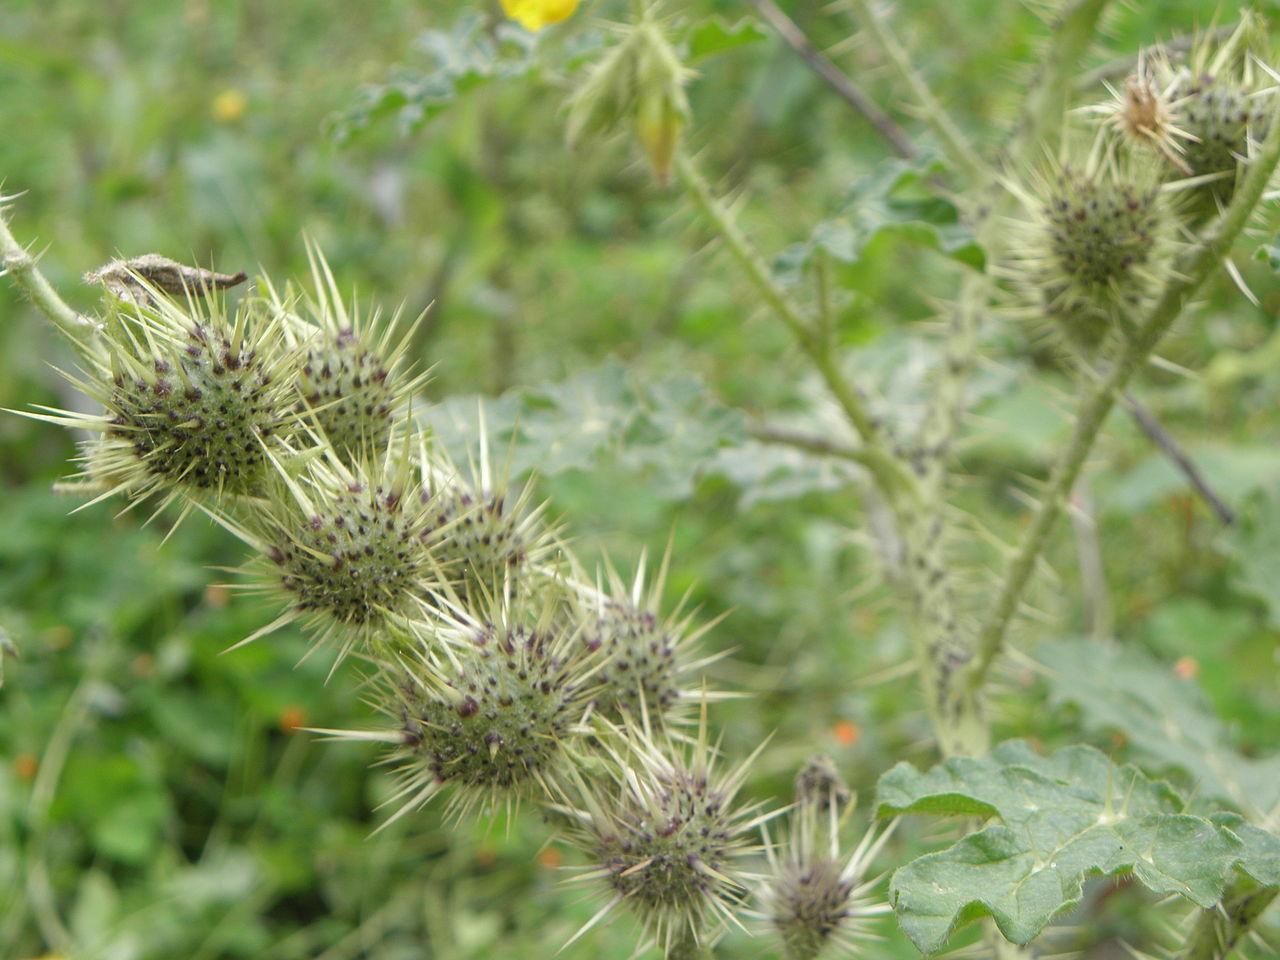 https://upload.wikimedia.org/wikipedia/commons/thumb/4/4a/Solanum_rostratum_RH_(6).jpg/1280px-Solanum_rostratum_RH_(6).jpg